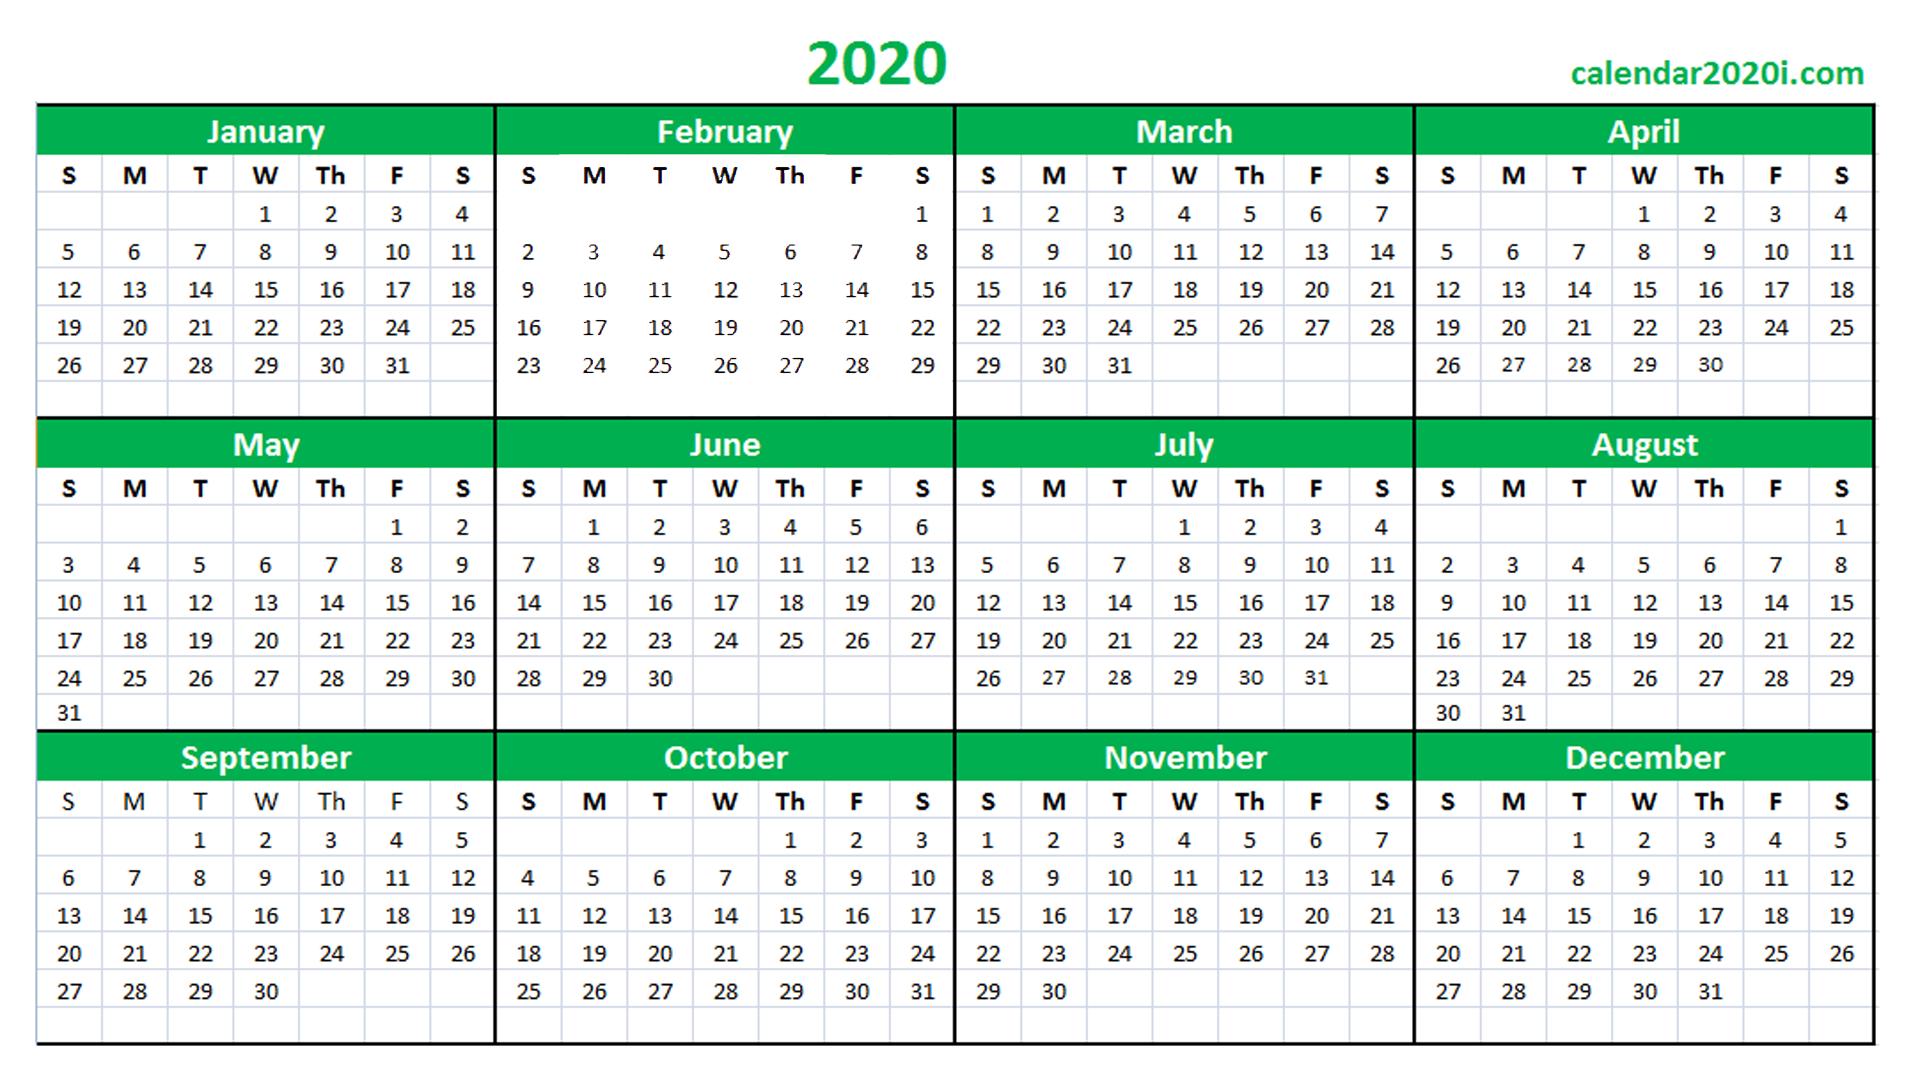 2020 Calendar Wallpapers - Wallpaper Cave inside 2020 Qld School Calendar Printable